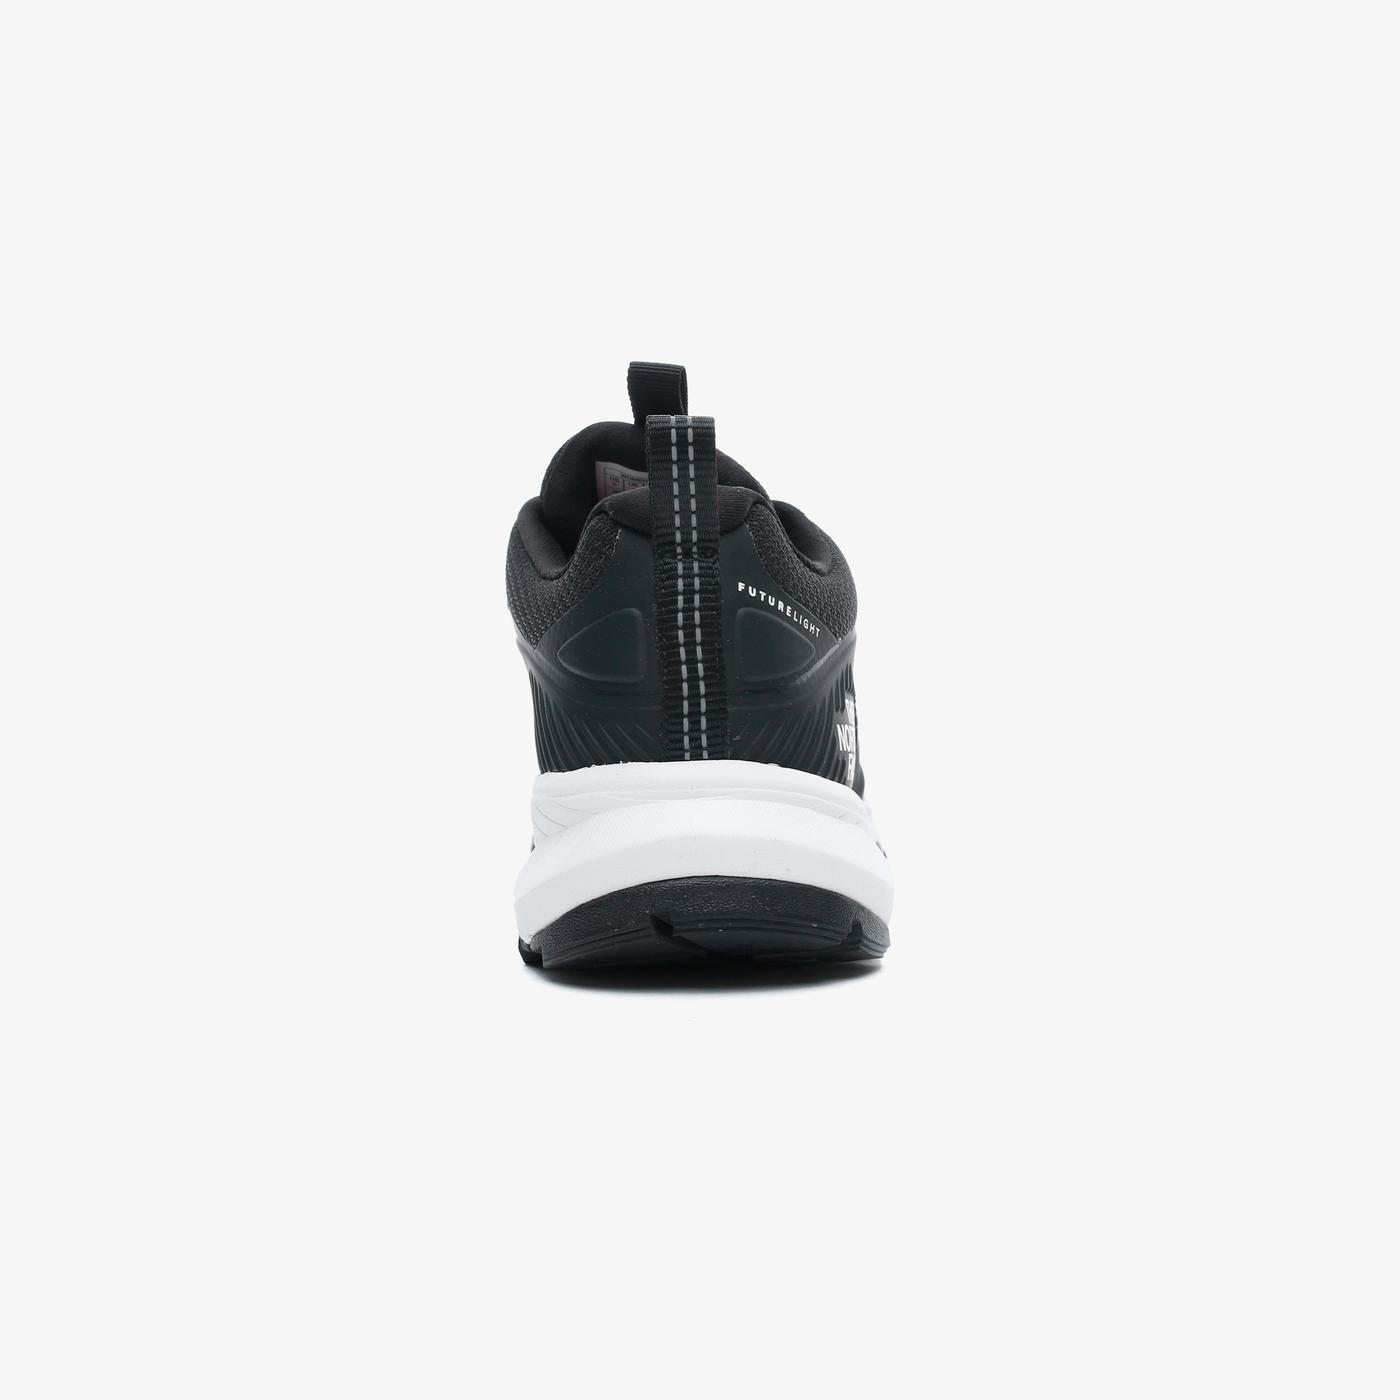 The North Face Ultra Fastpack IV Futurelight Kadın Siyah Spor Ayakkabı